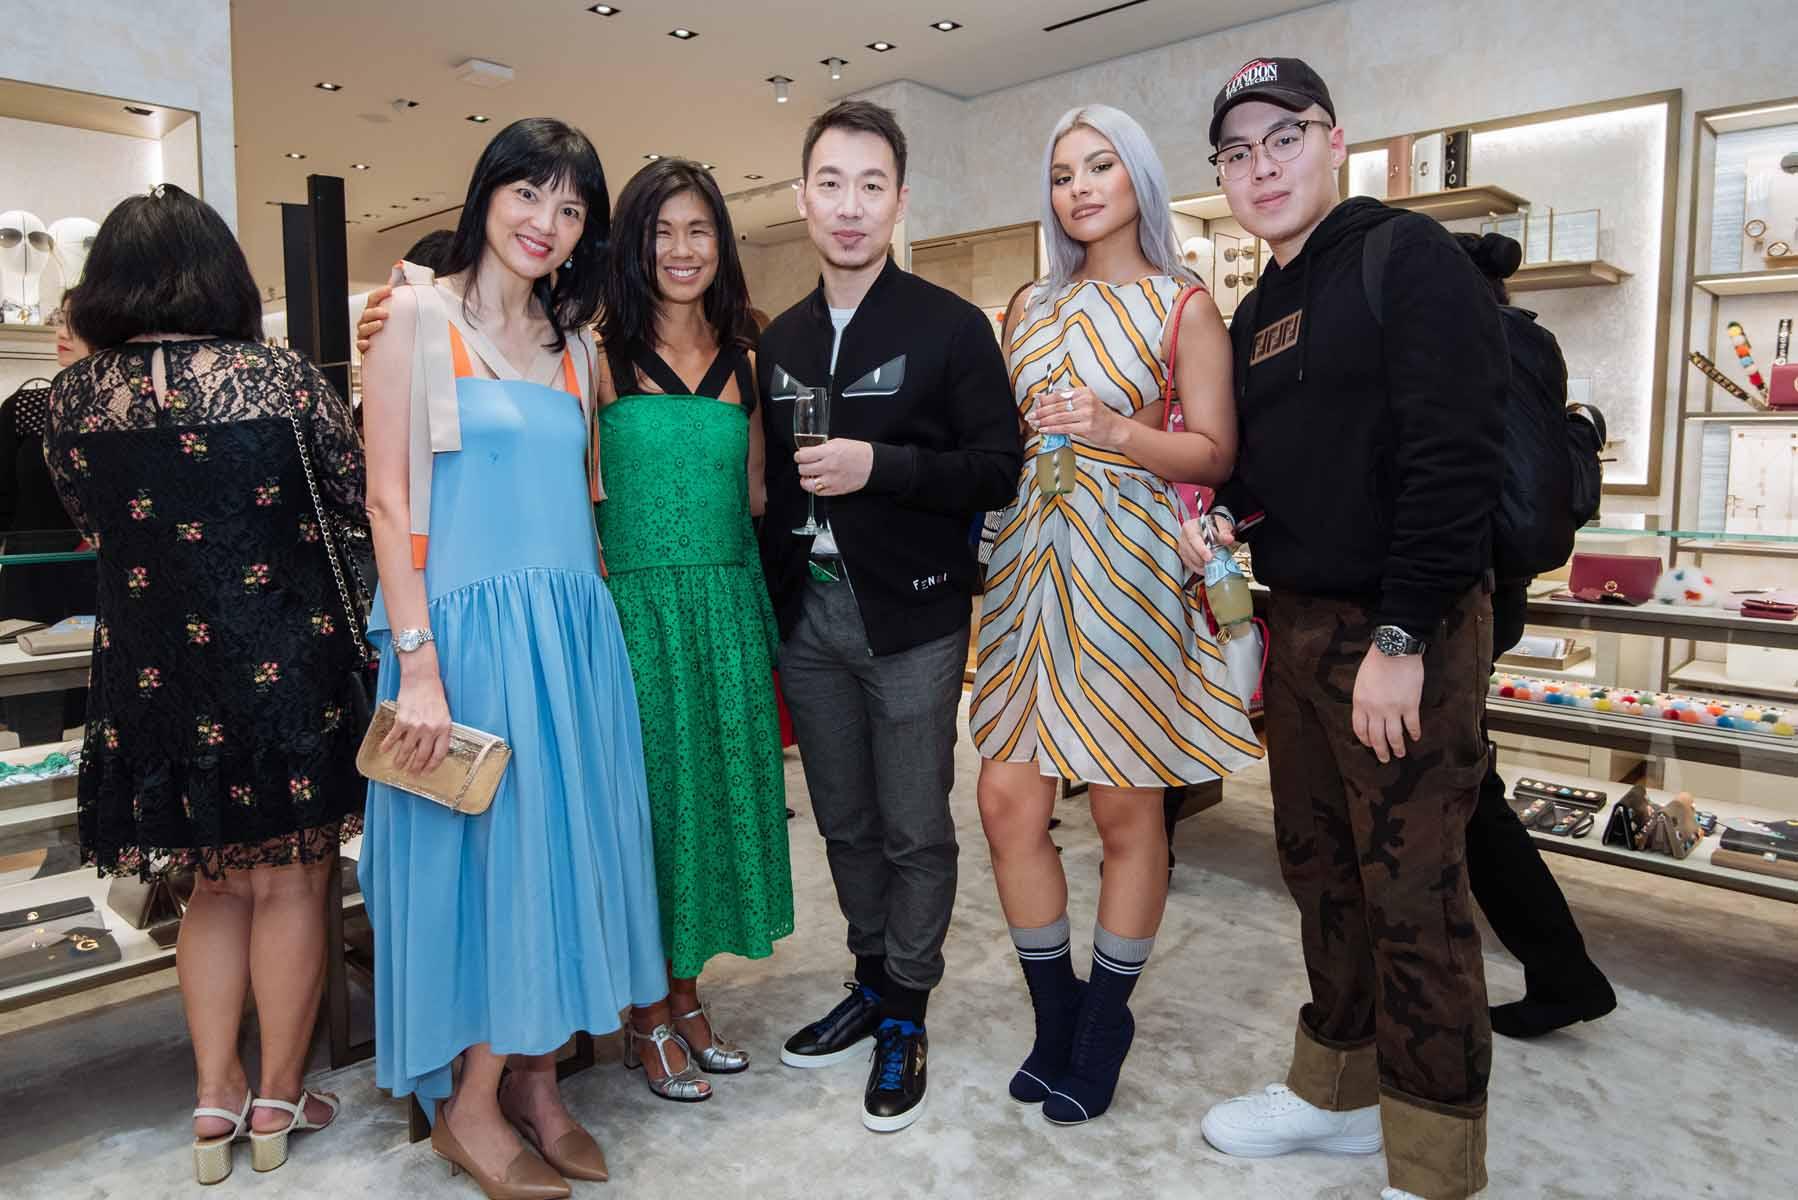 Mui Hong, Clara Goh, Chris Chong, Tabitha Nauser, Adam Choong